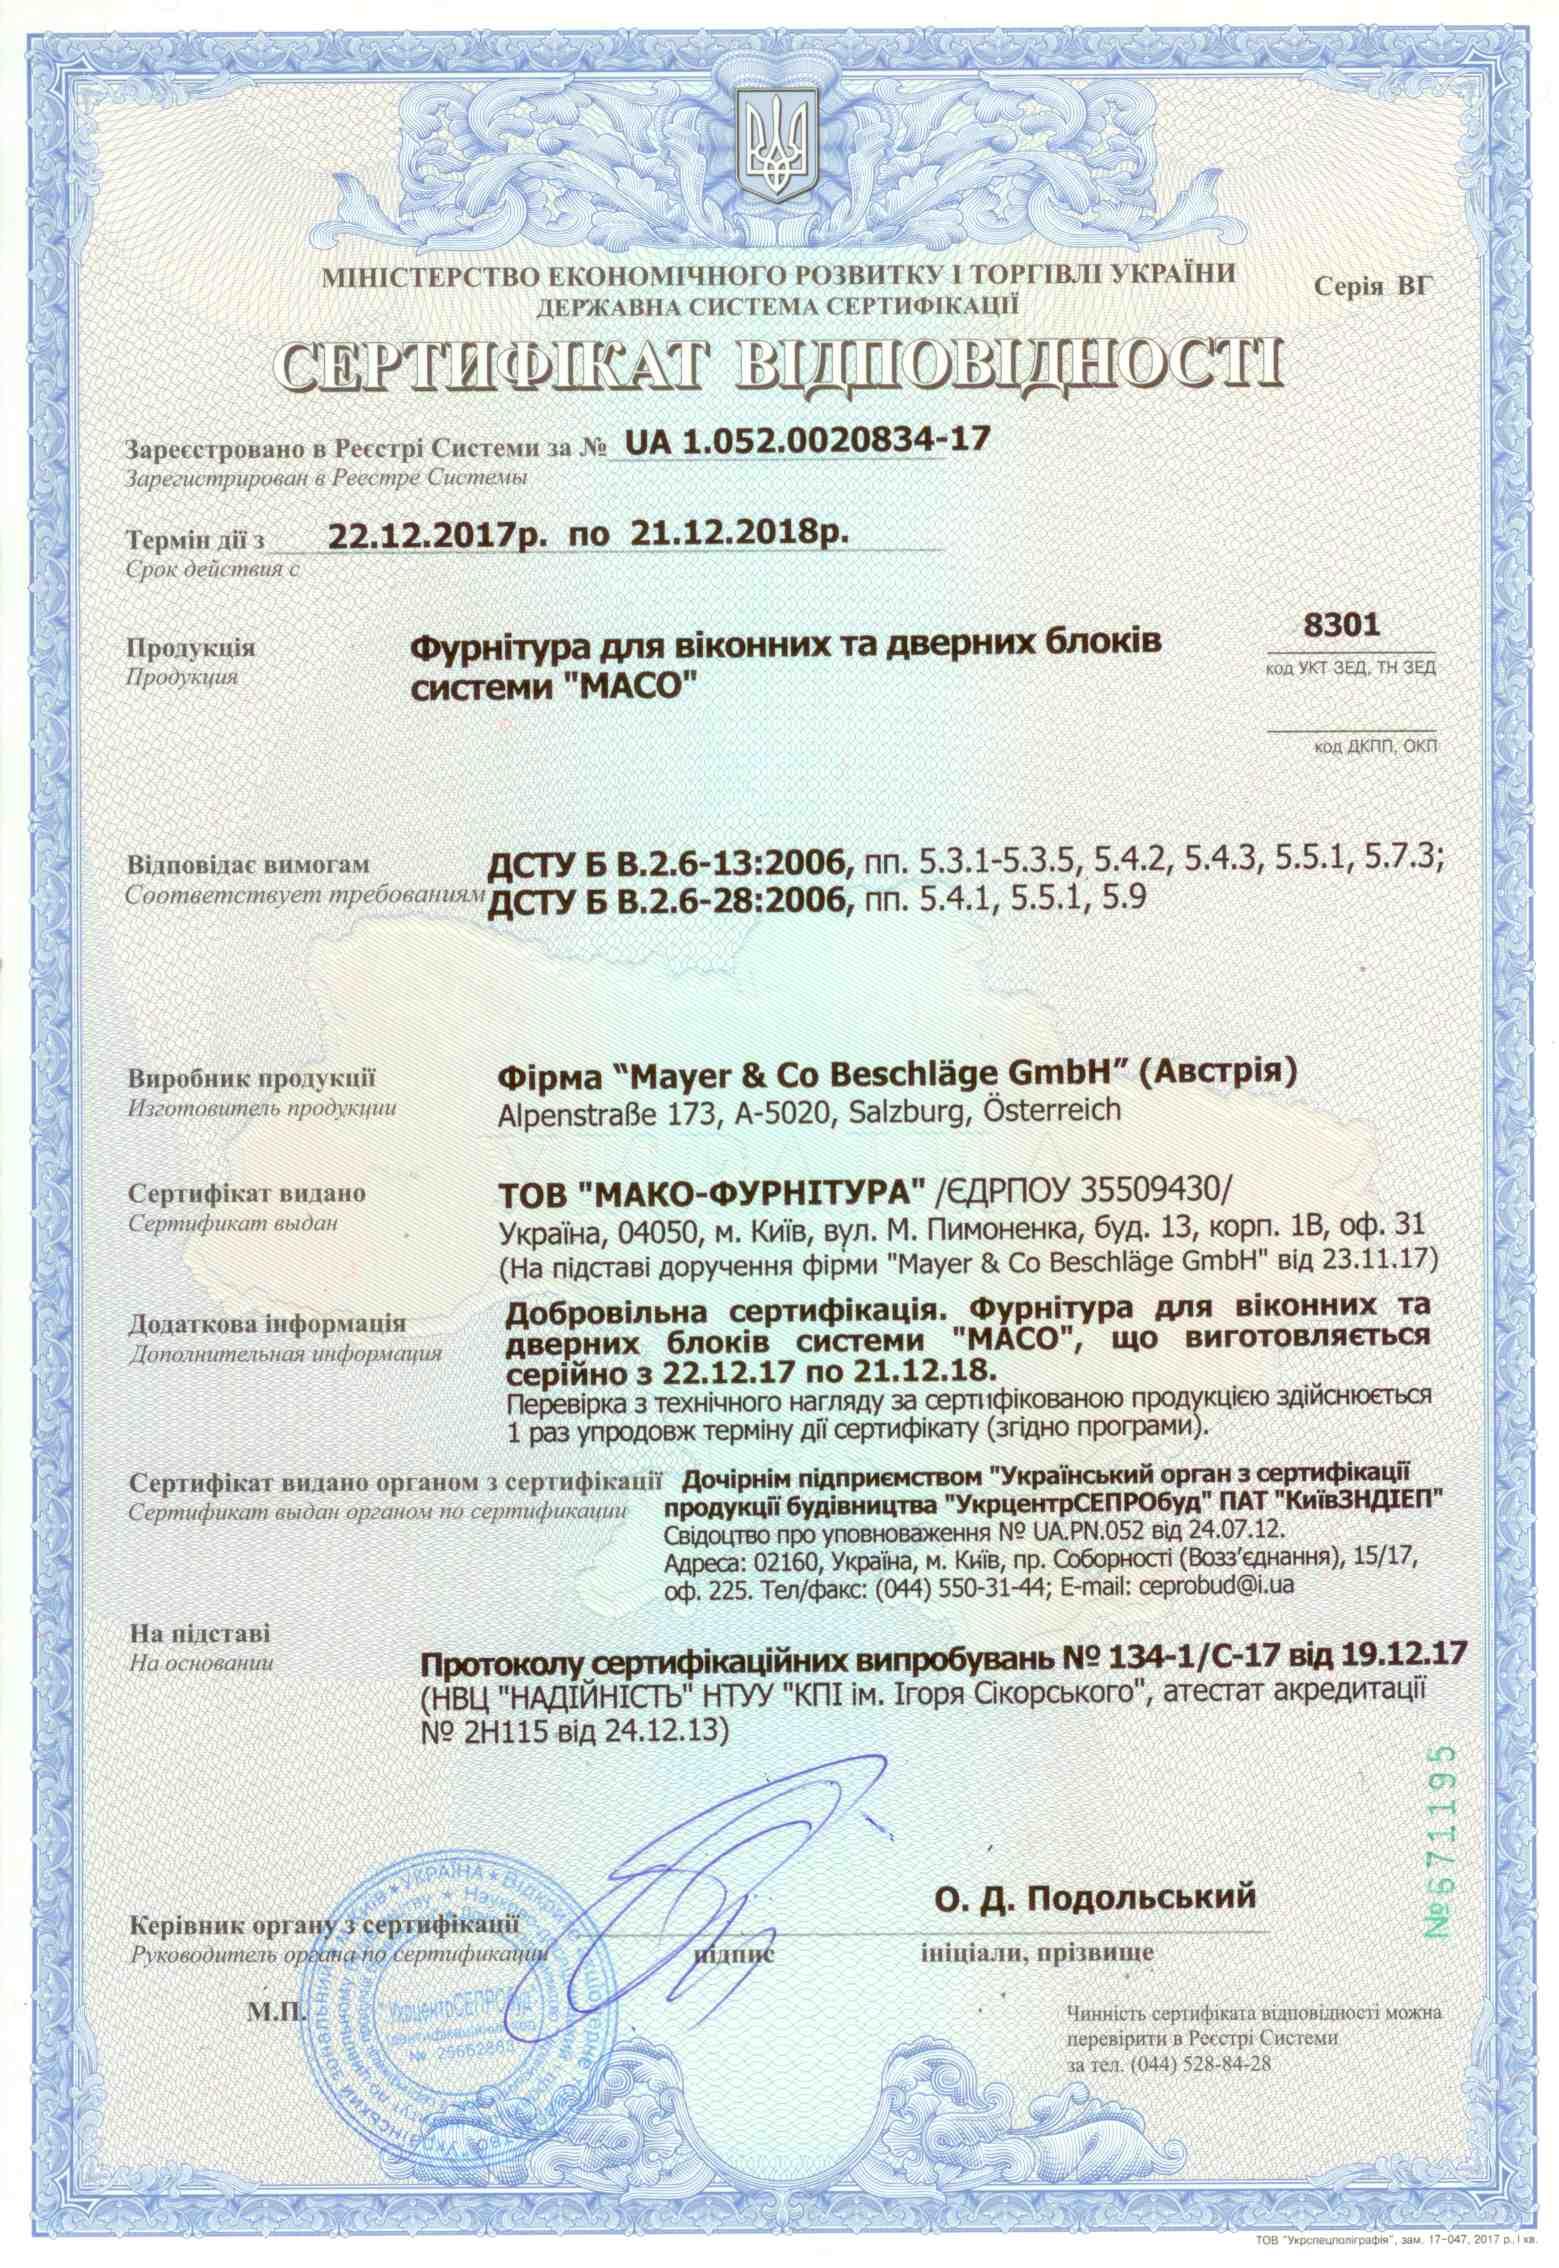 Сертификат фурнитуры Maco